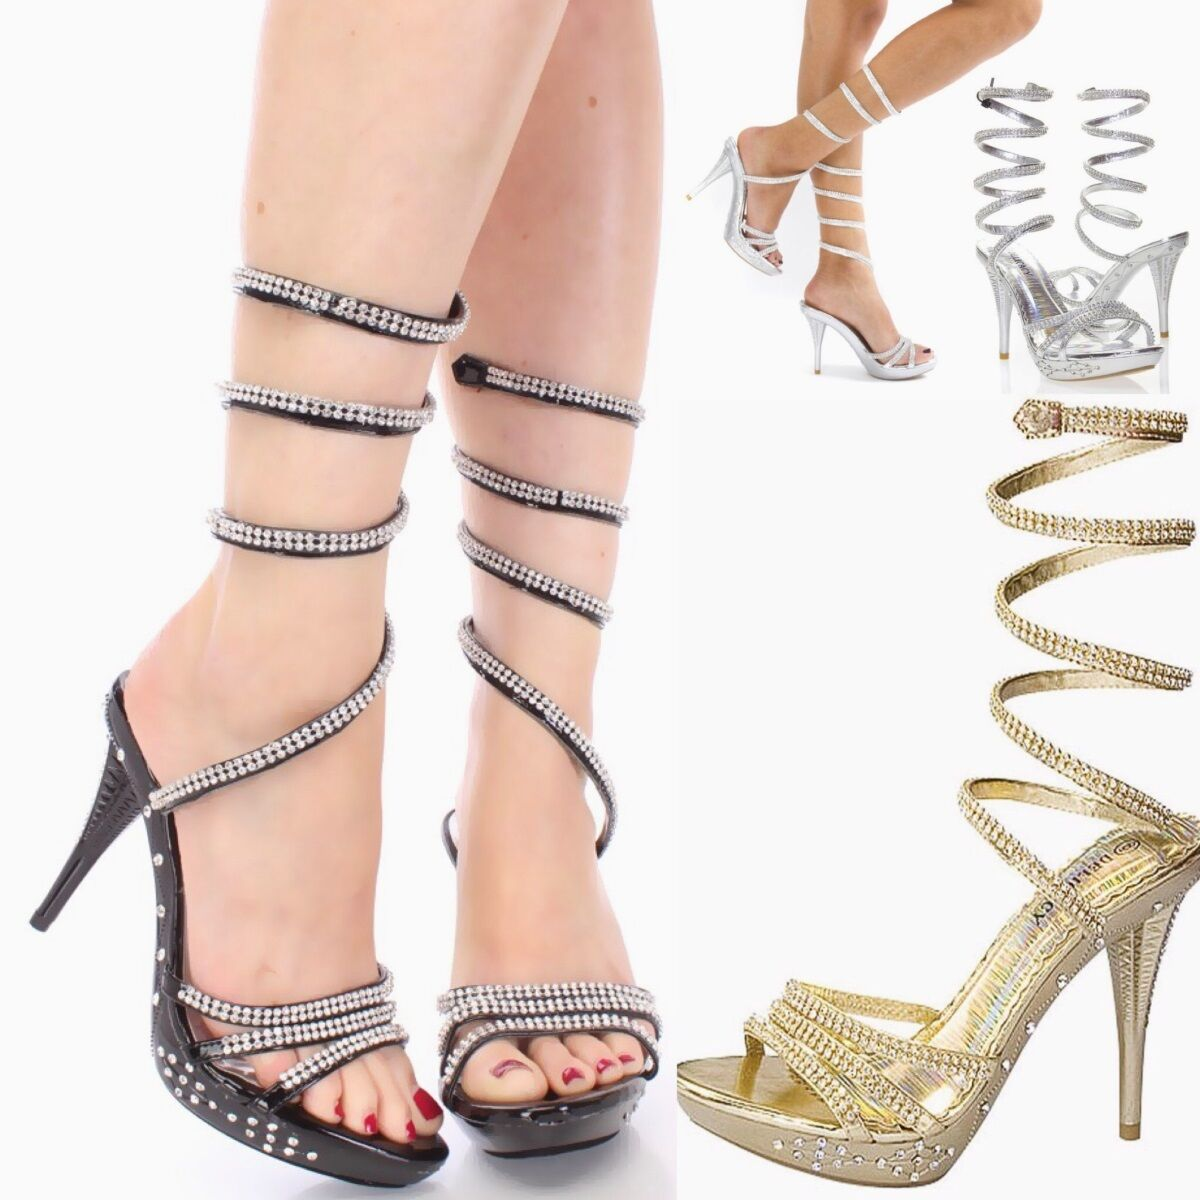 Fancy Wedding Rhinestone Wrapped Stiletto High Heels Platform Pumps Sandals H127